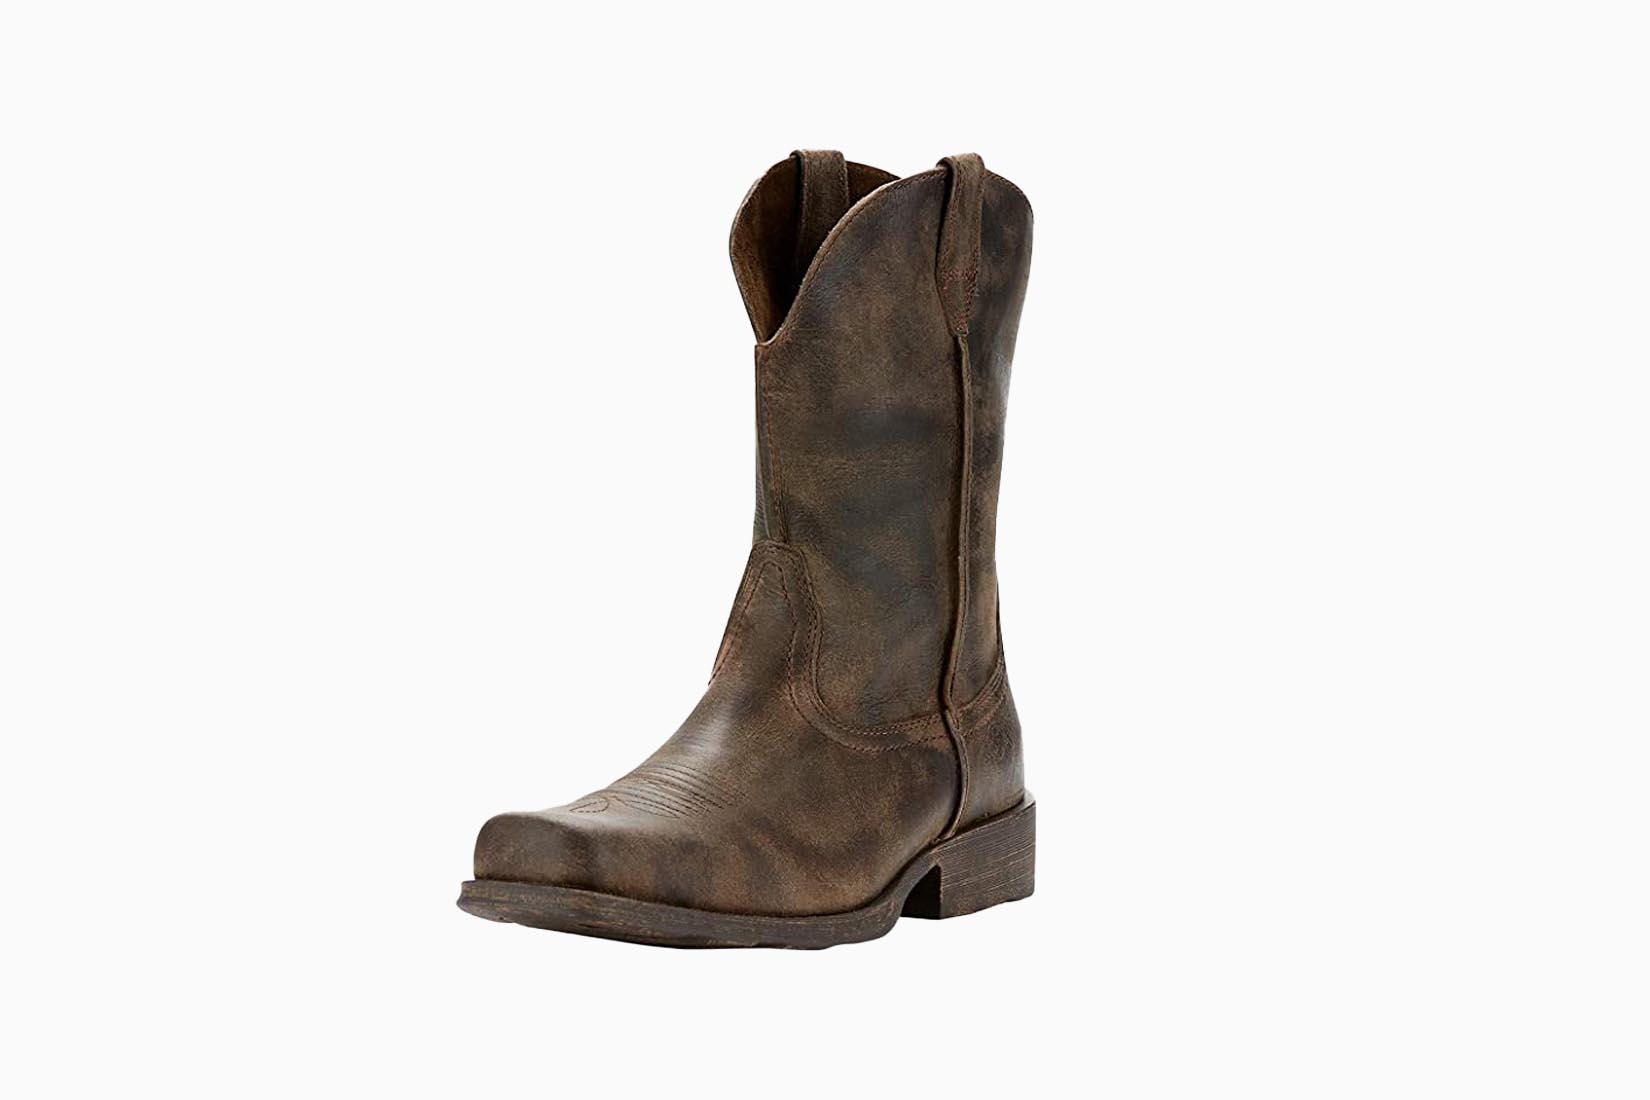 best boots men ariat rambler western boot review Luxe Digital